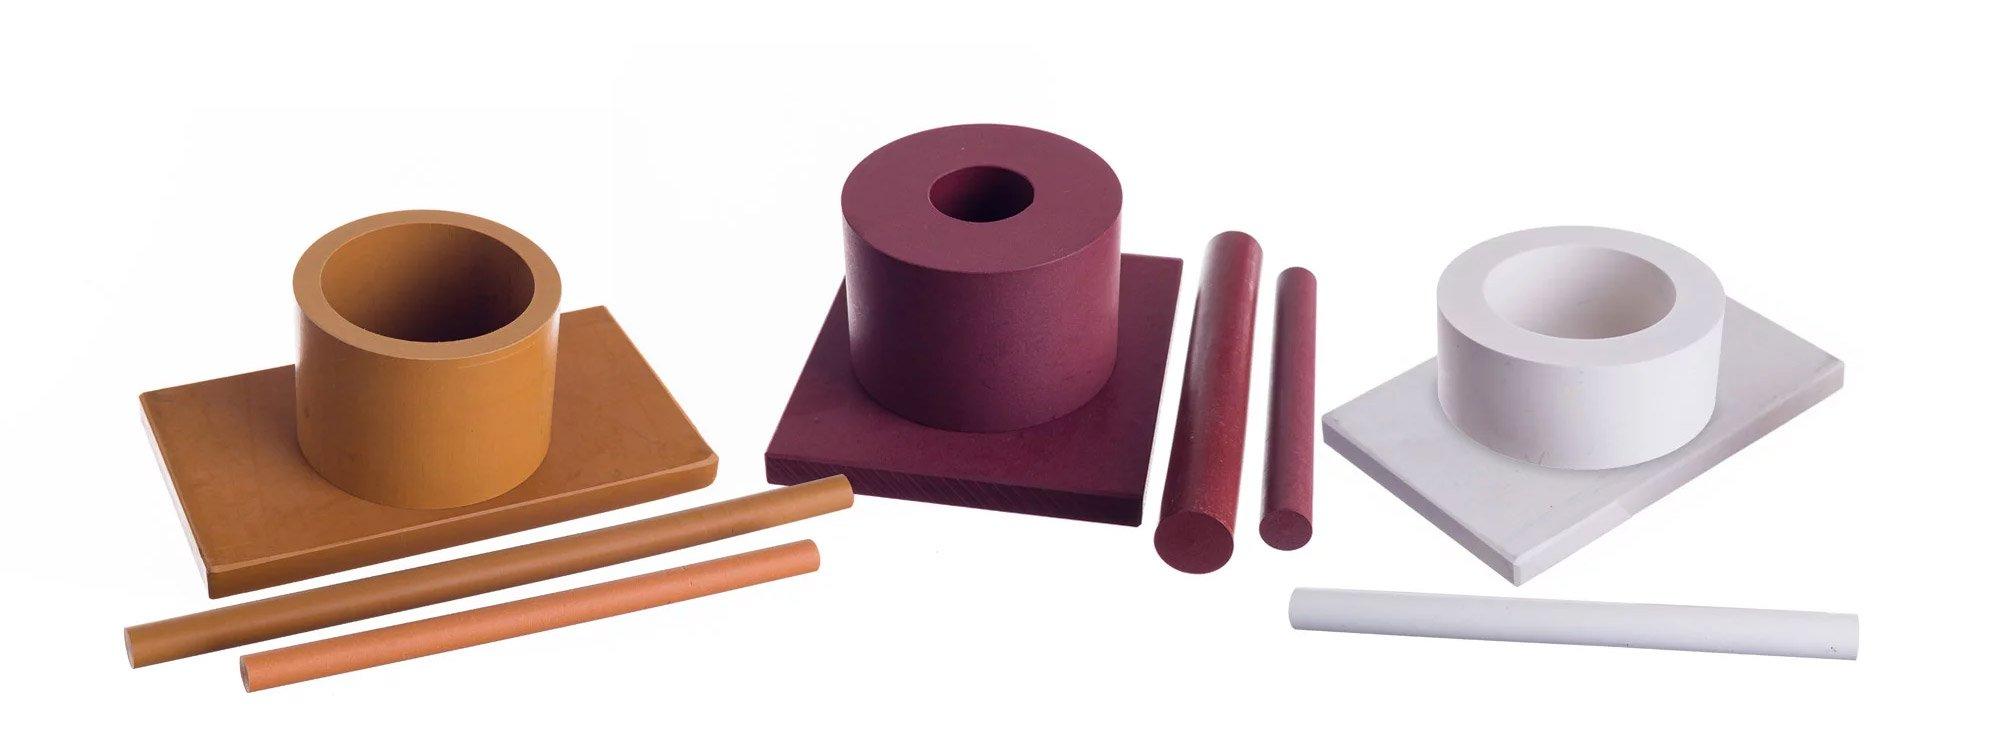 rulon-materials-hero2